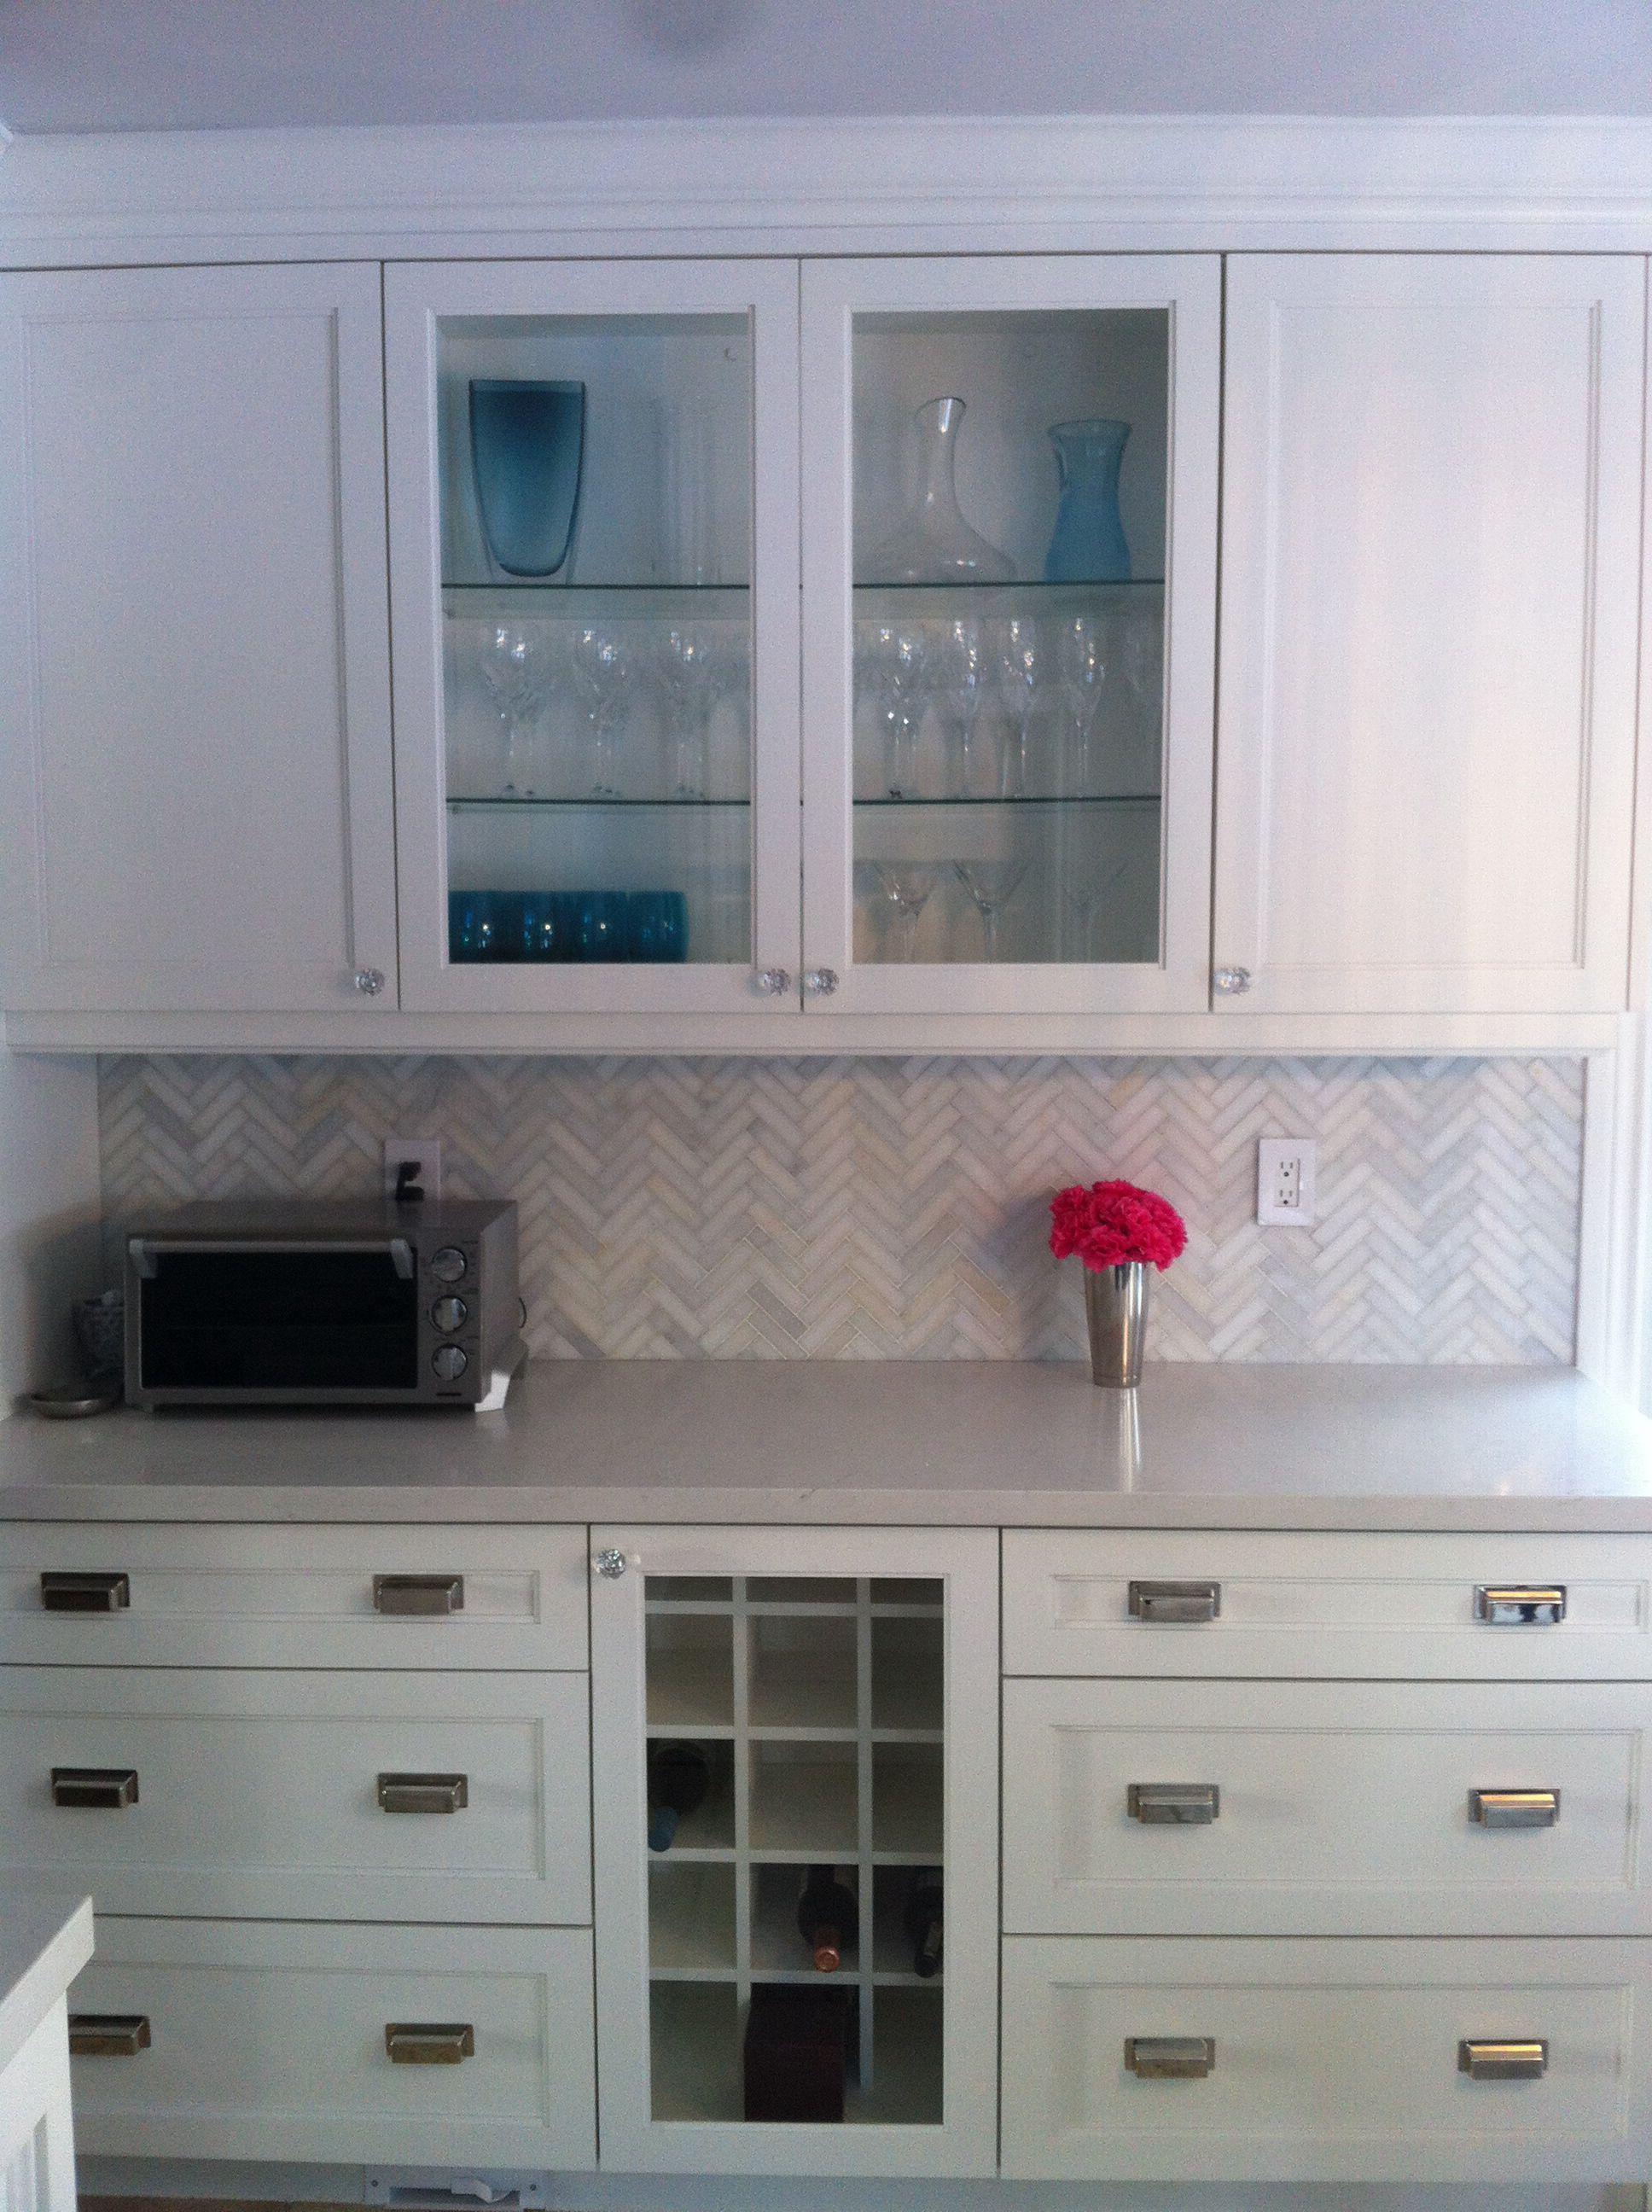 benjamin moore simply white kitchen cabinets calcutta Kitchen Stone Backsplash with White Cabinets Antique White Kitchen Cabinets with Backsplash Ideas